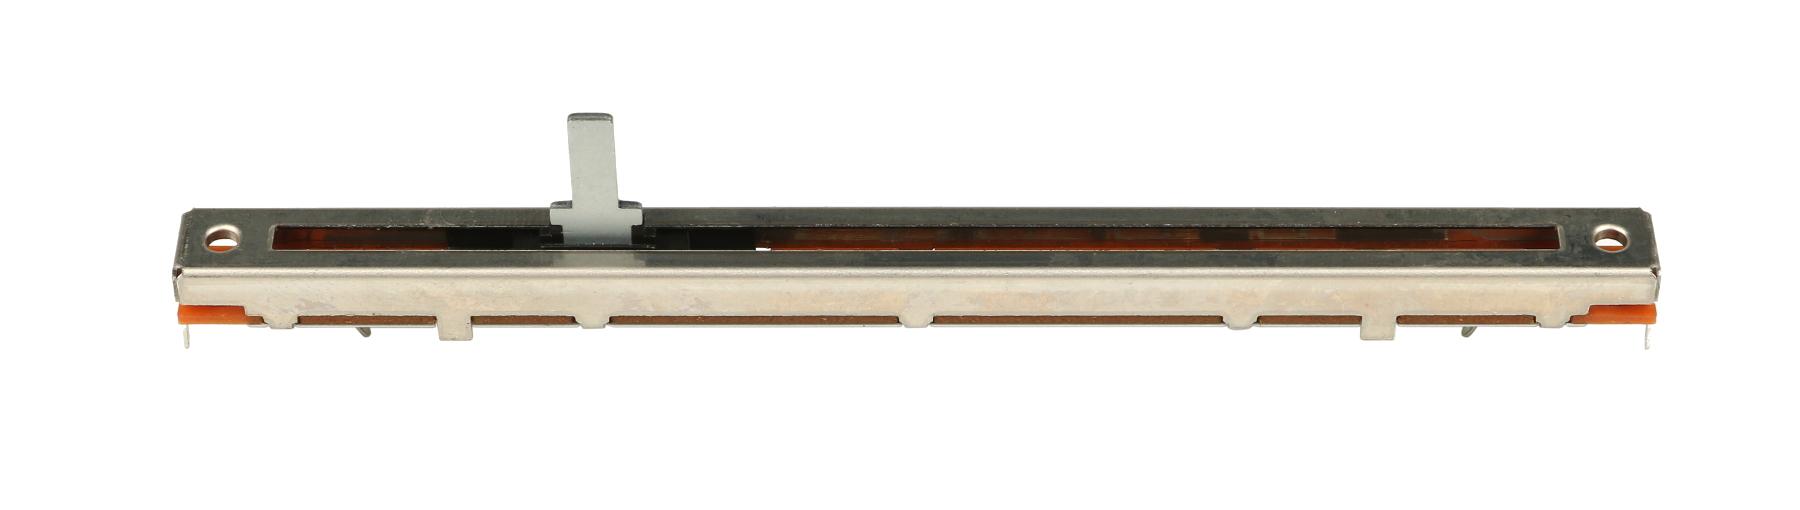 Mono Fader for GA24, GA32, MC32 Series